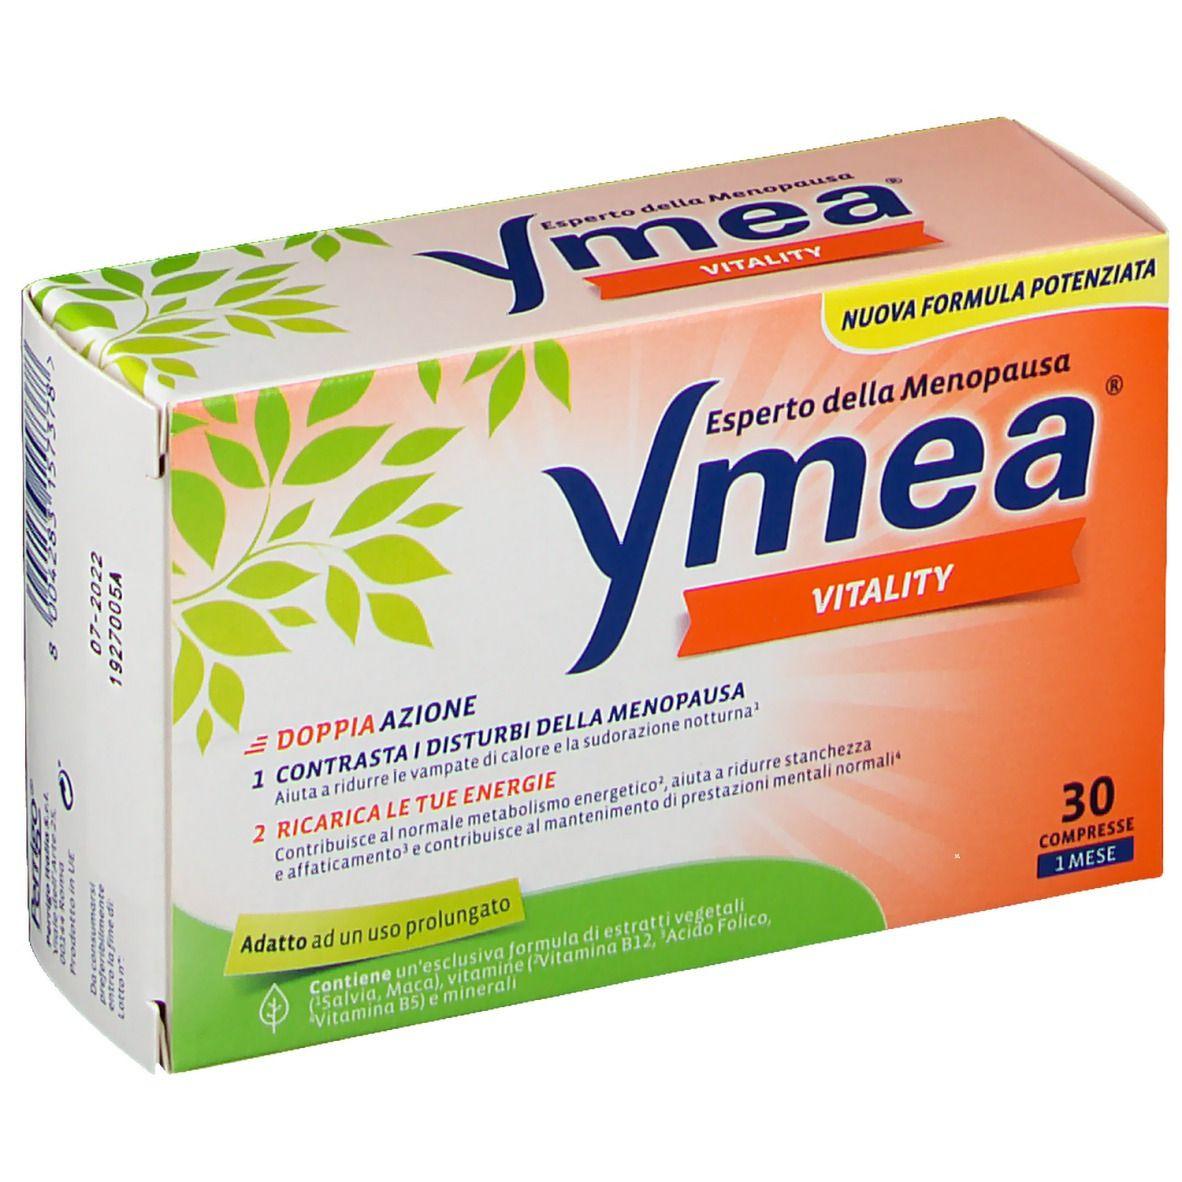 Ymea® Vitality